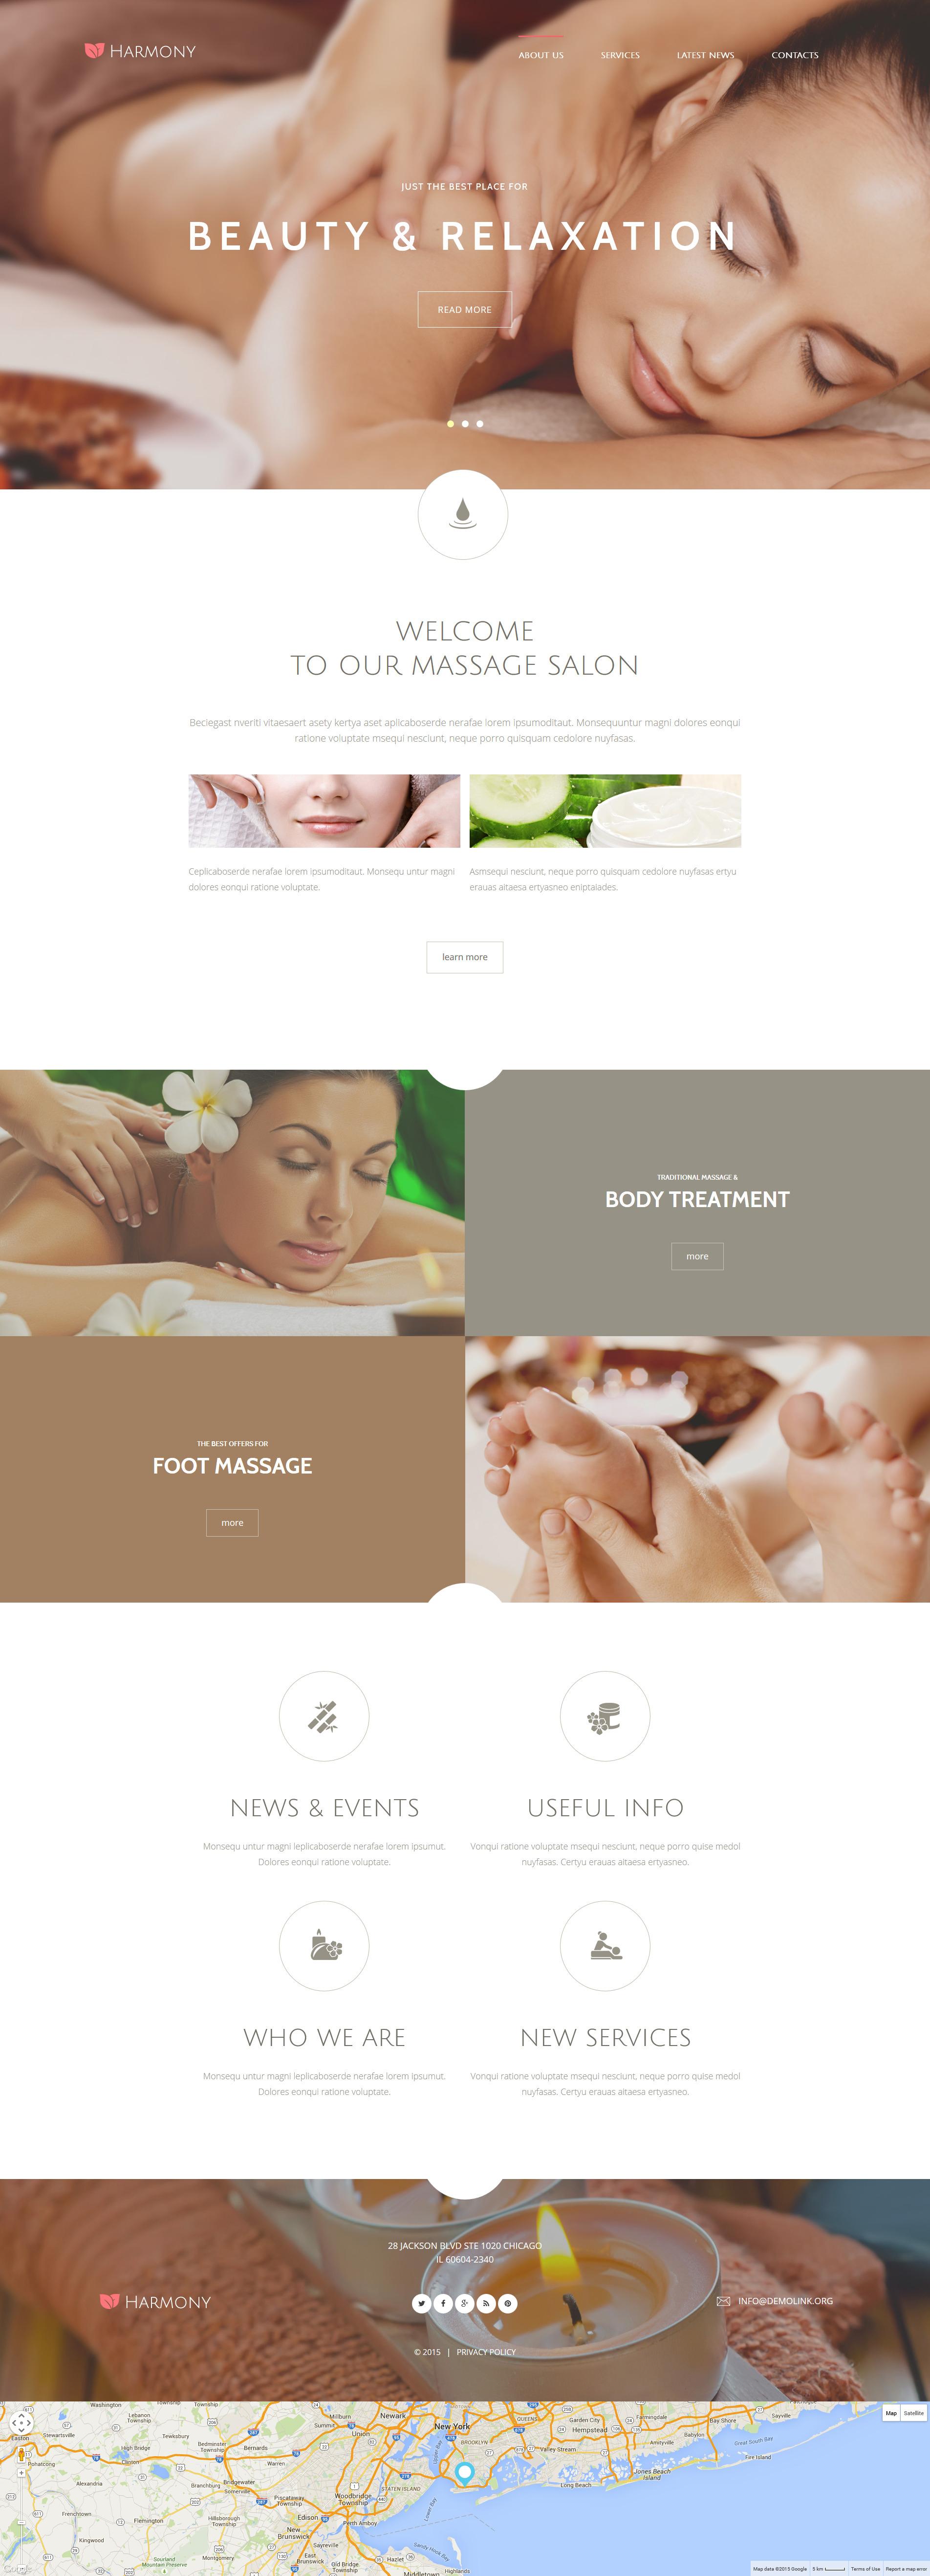 """Harmony - Massage Salon Responsive Elegant"" - адаптивний Joomla шаблон №55058"